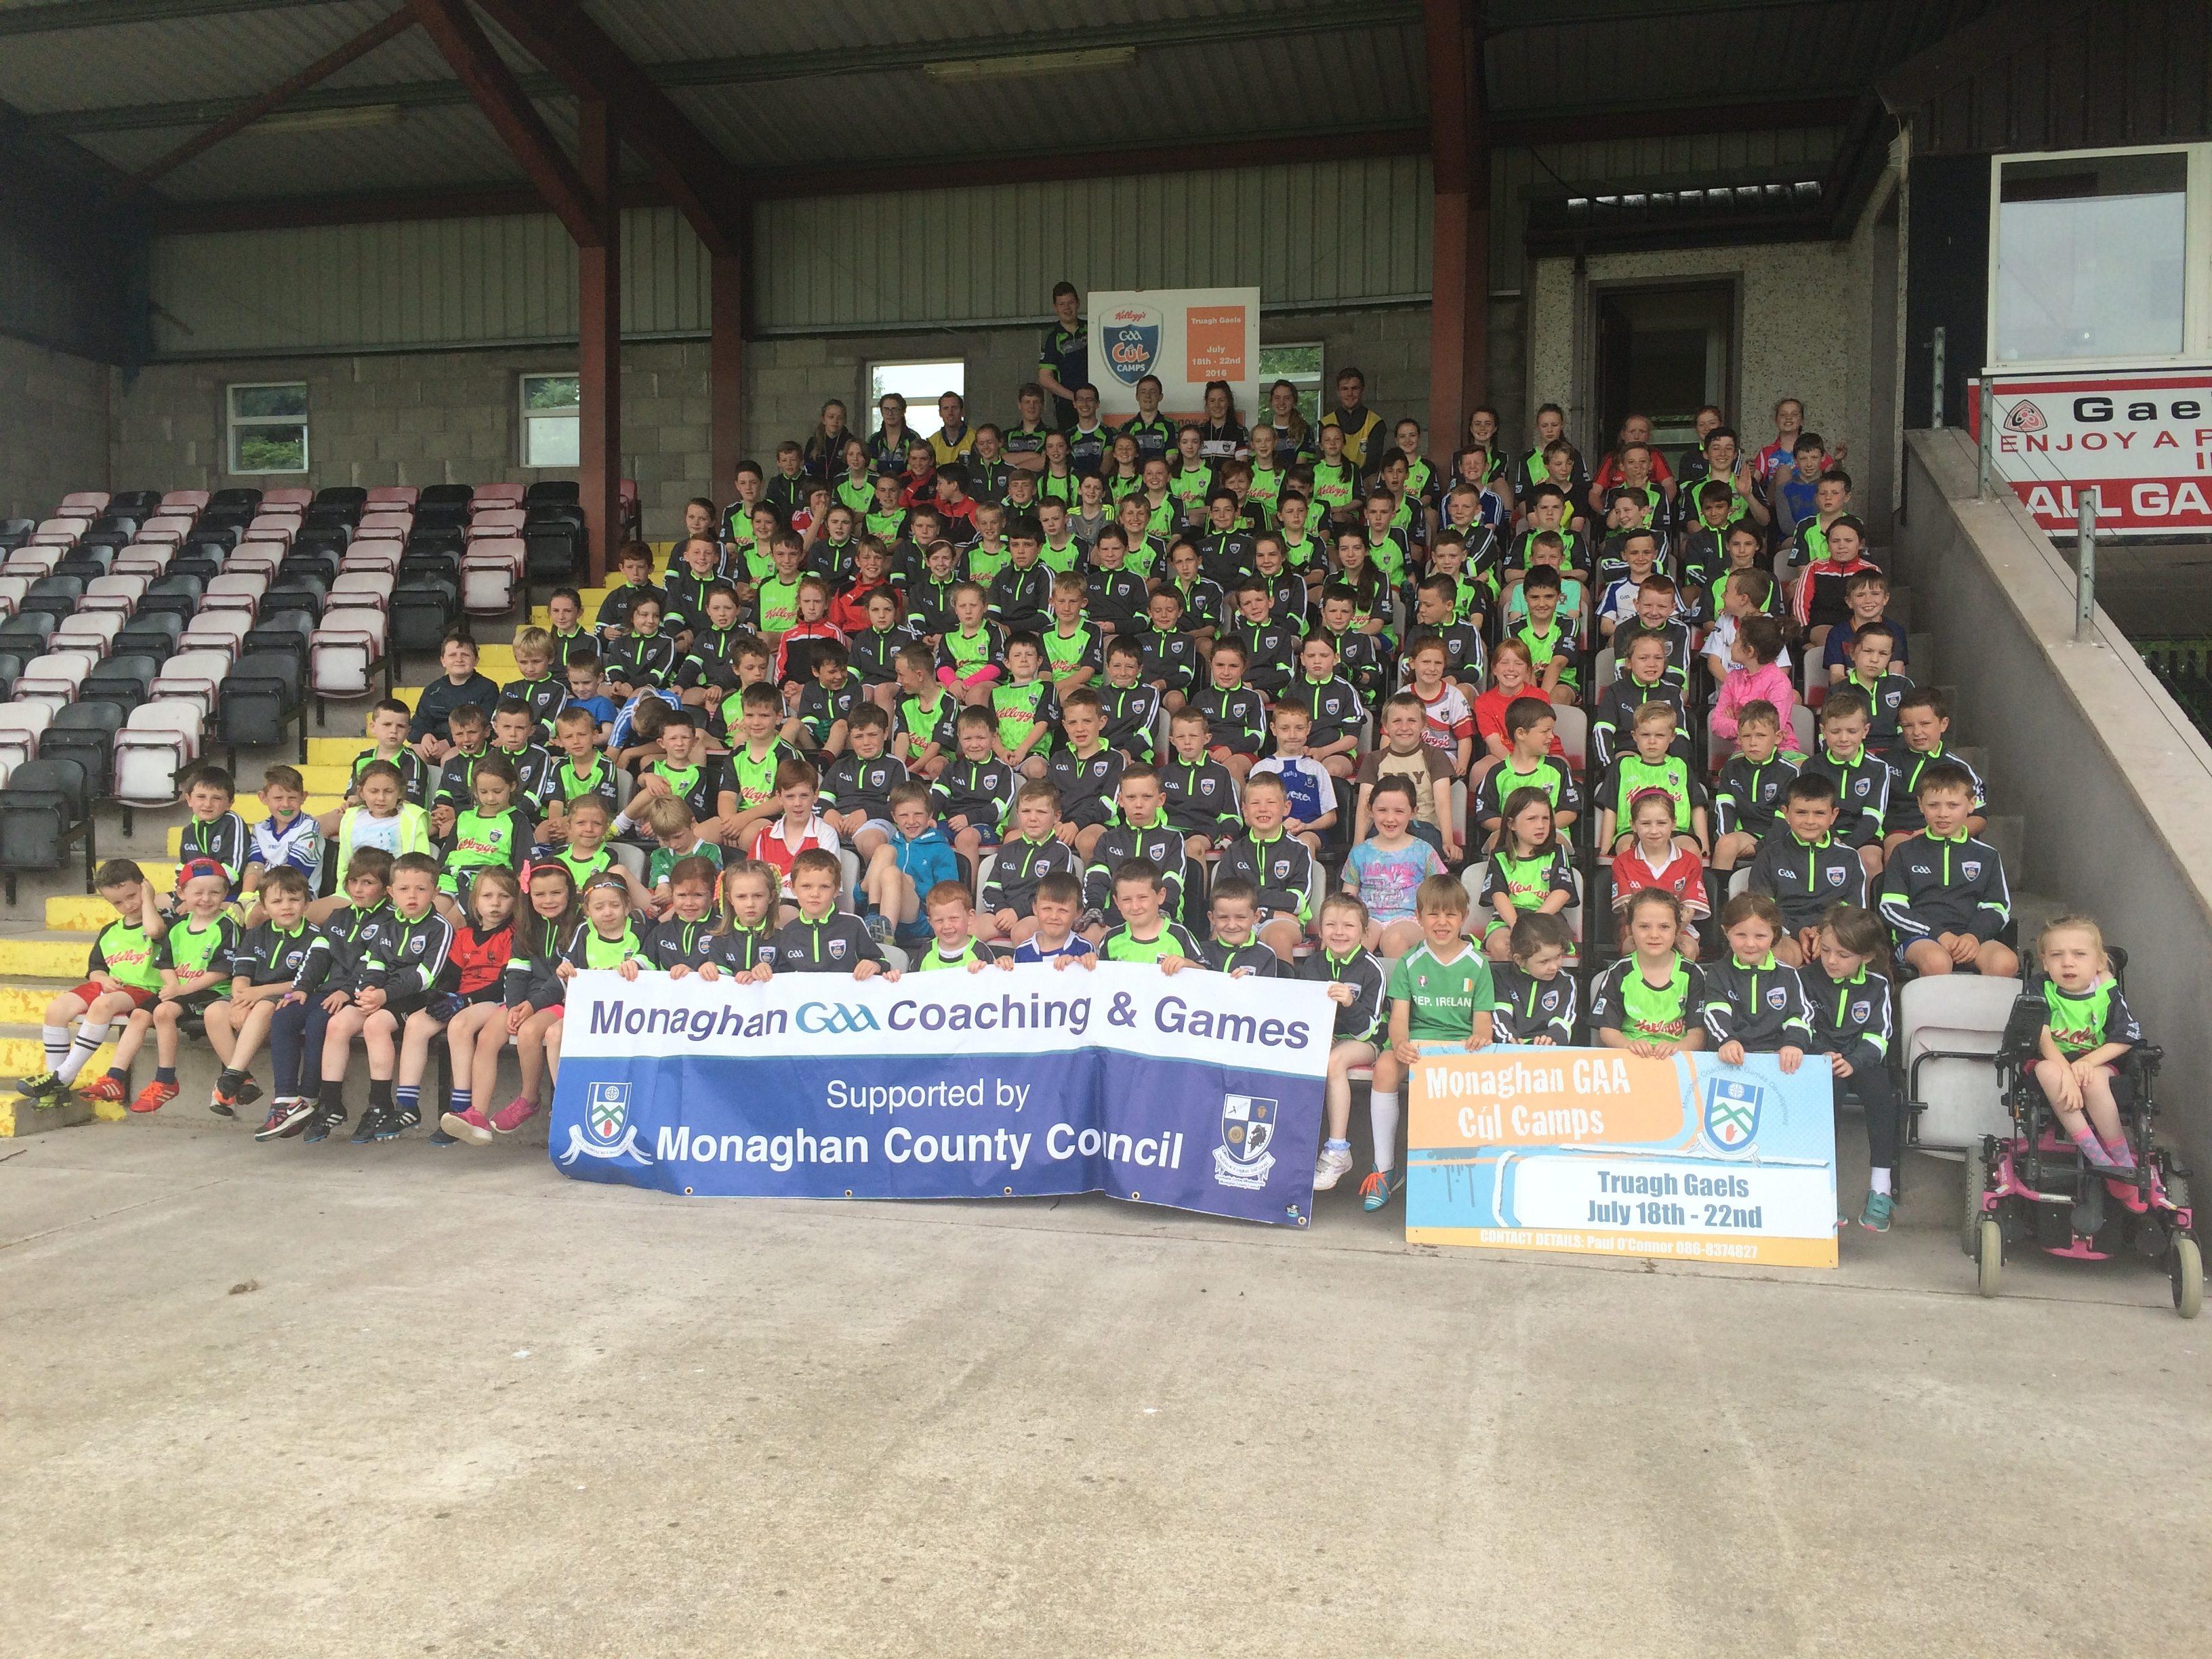 Monaghan Kellogg's Cul Camps – Week 3